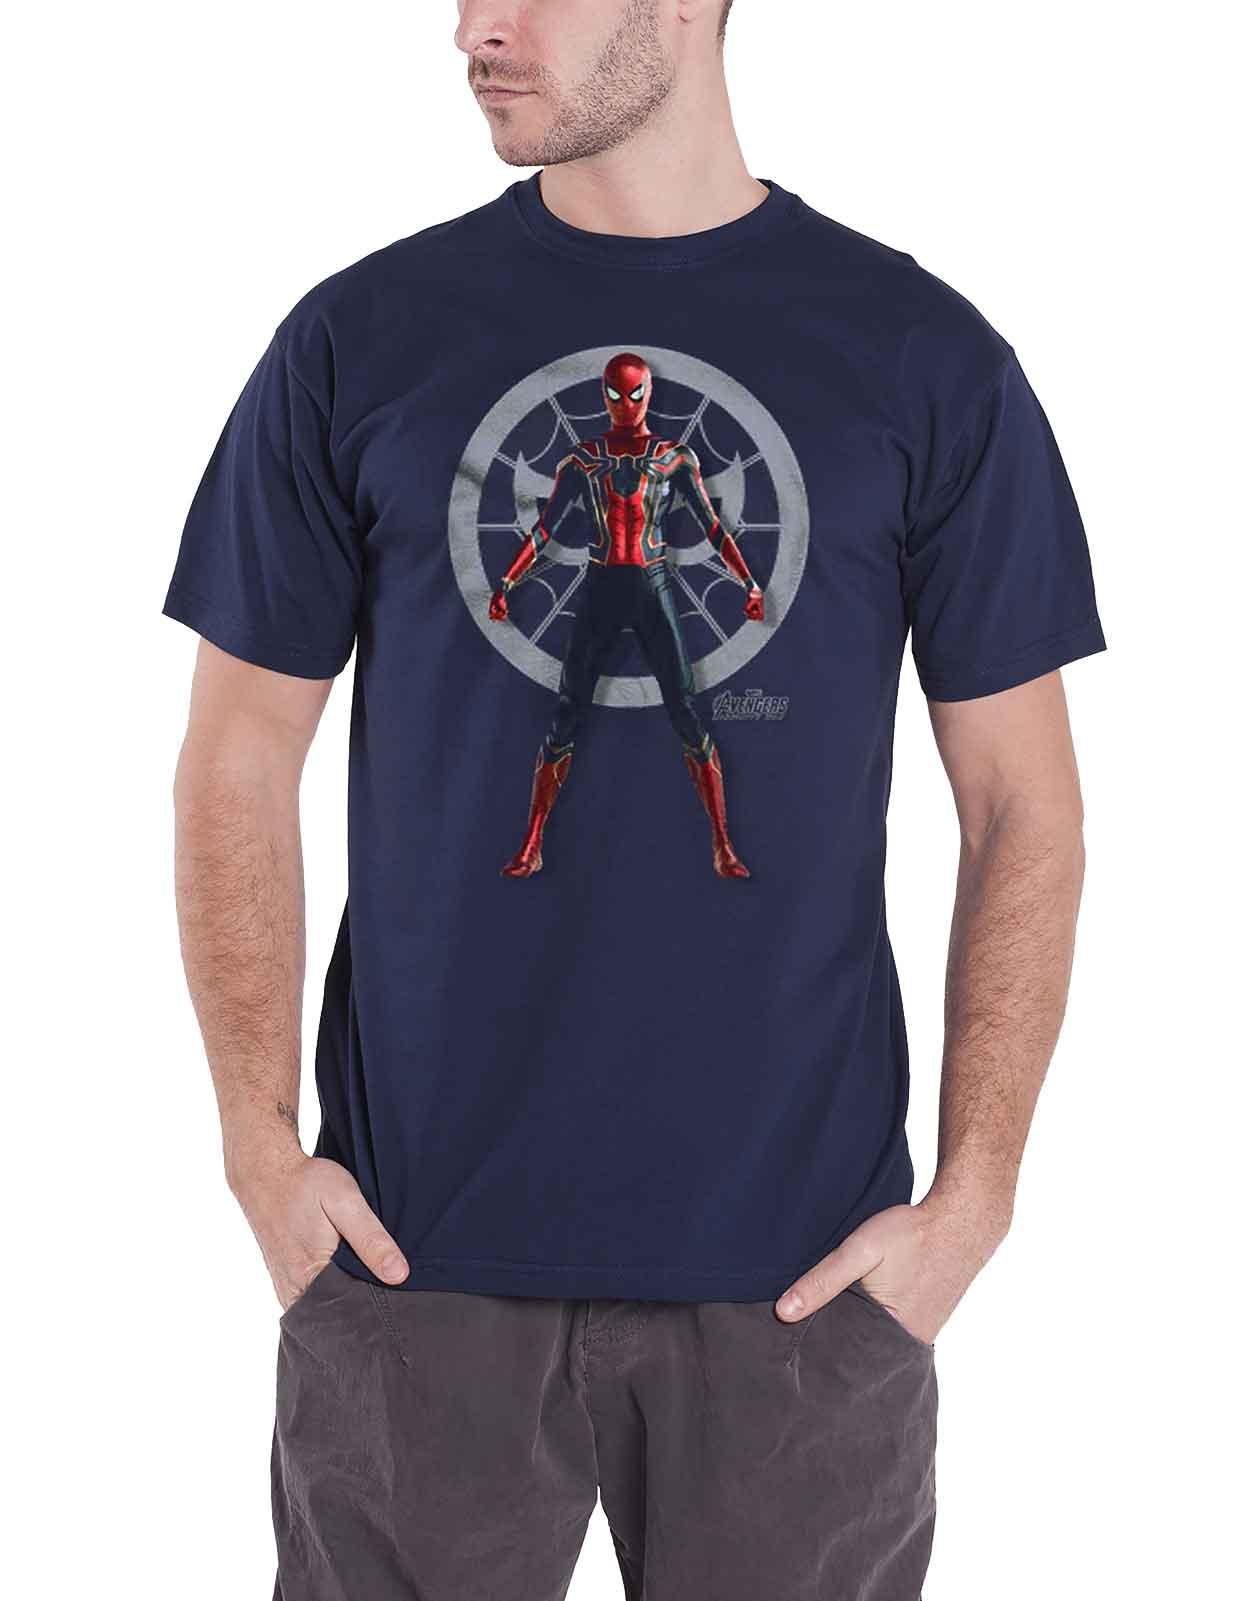 340d50a4c Avengers Infinity War T Shirt Spiderman stance new Official Marvel ...